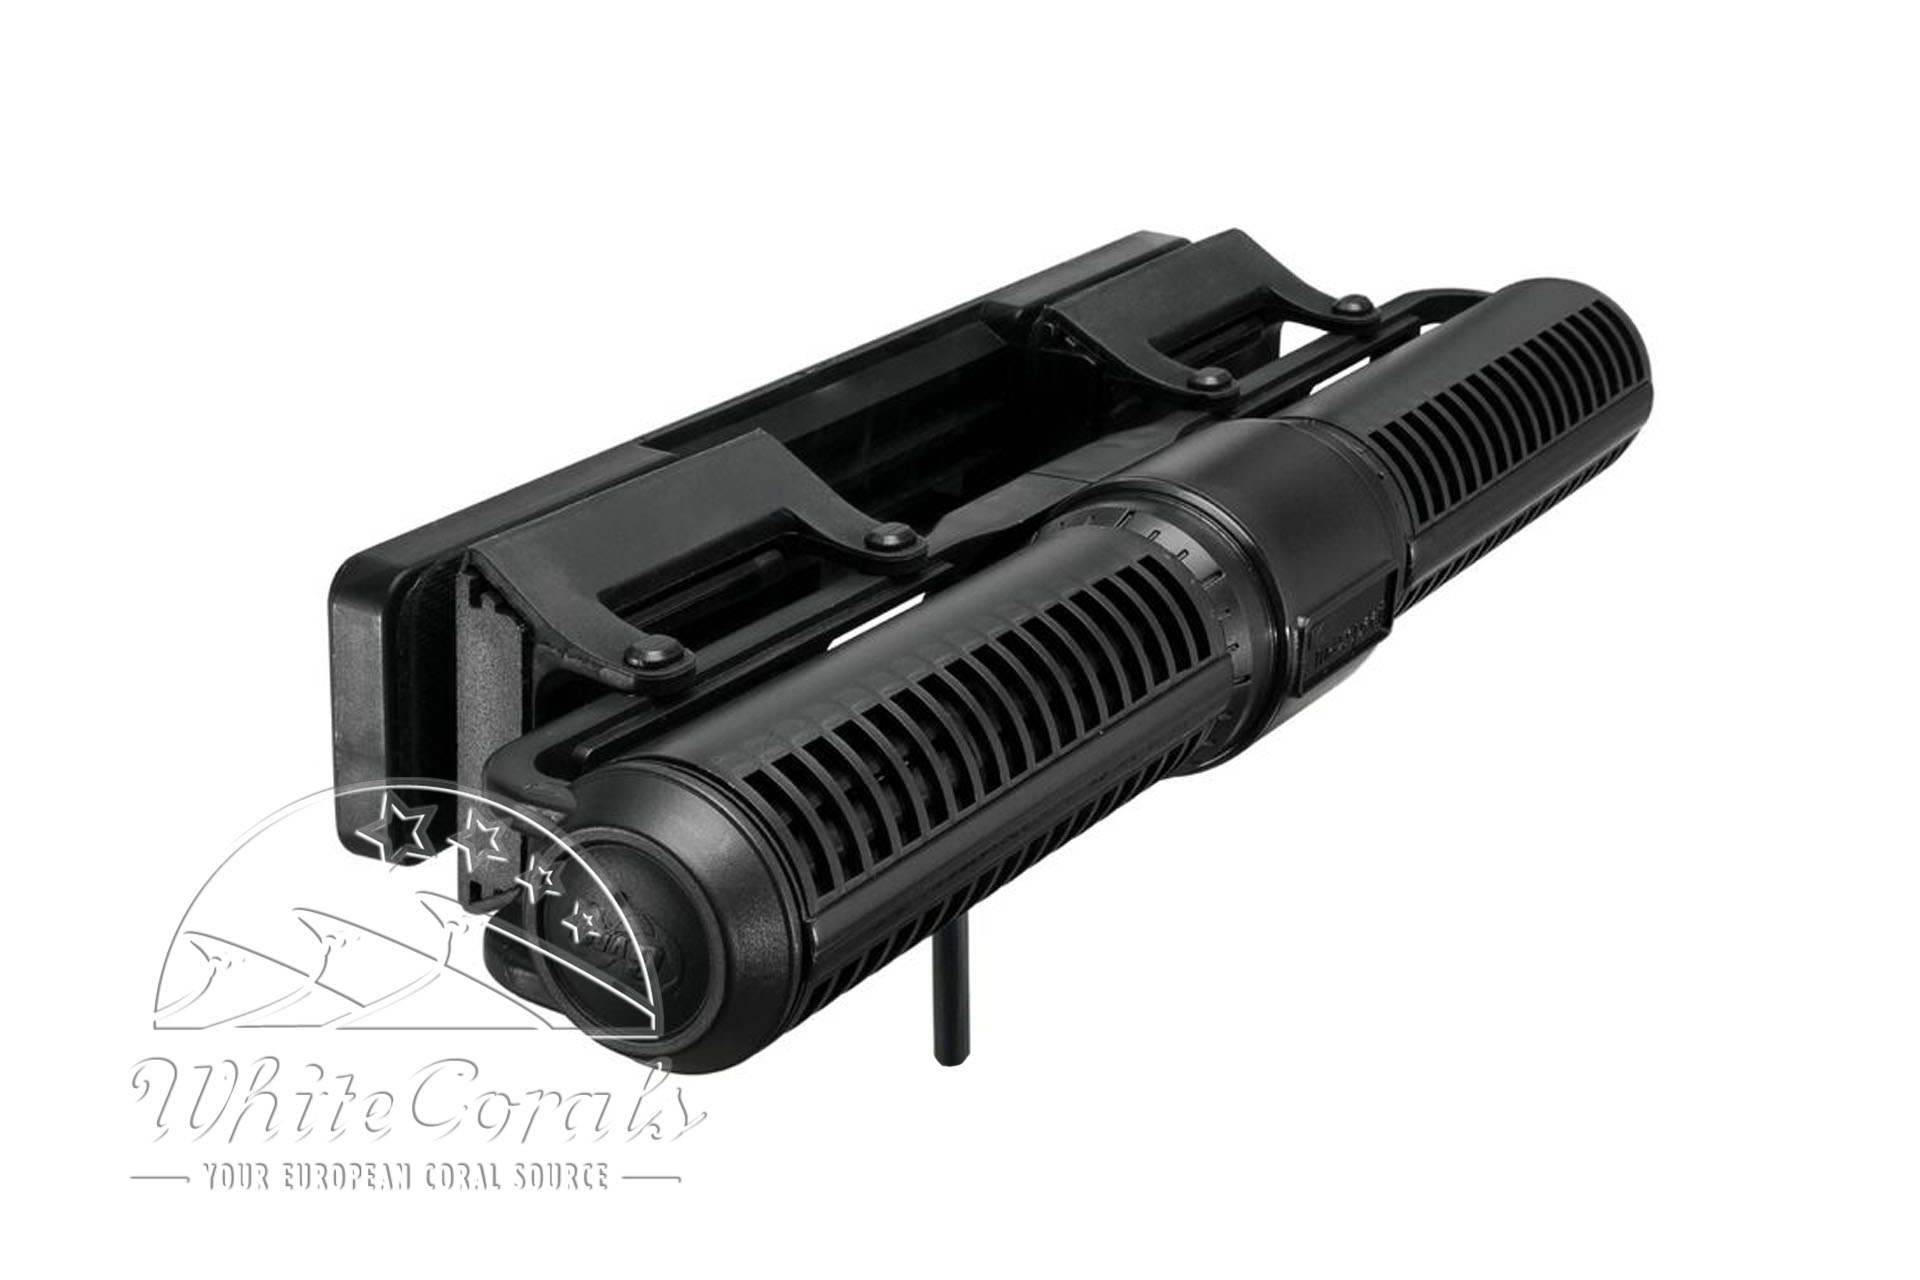 Maxspect Gyre XF-230 35W Pumpe